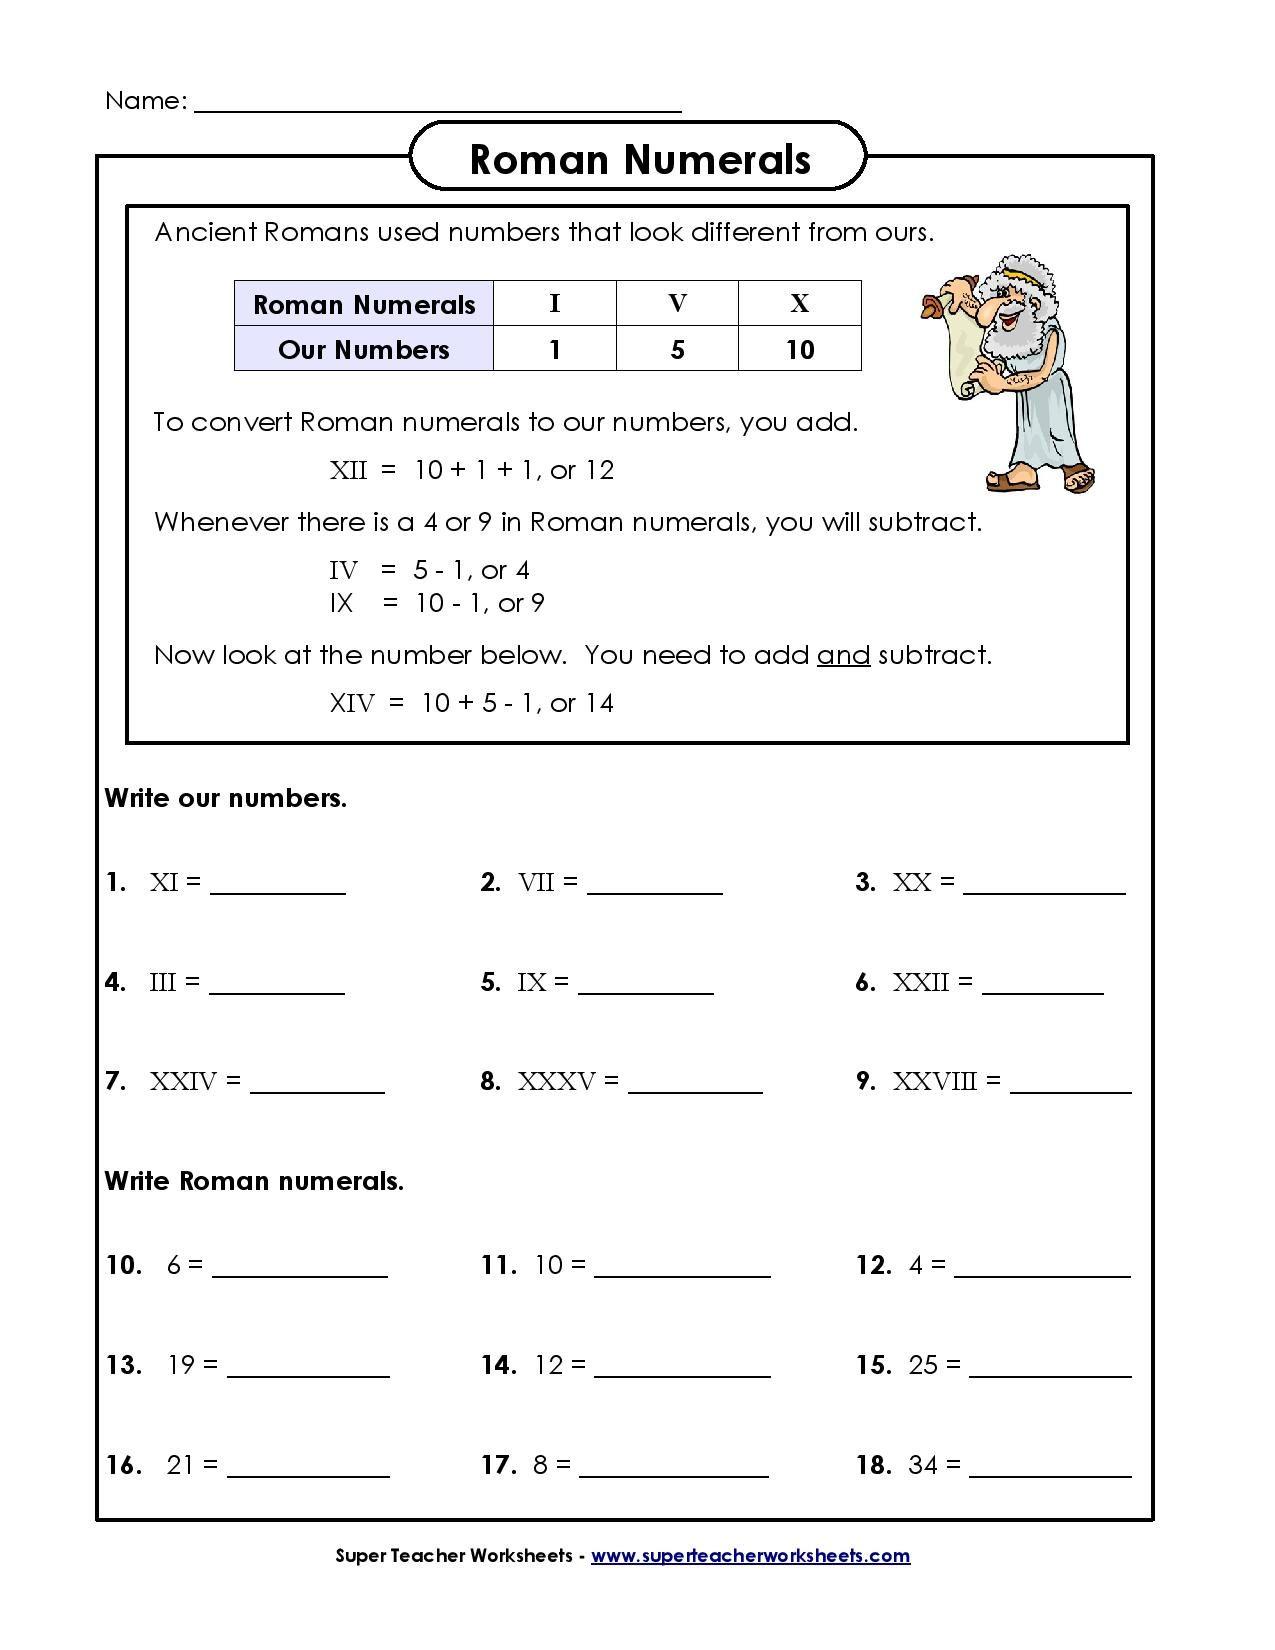 medium resolution of ✓ Best 4th Grade Math Worksheet - You Calendars  https://www.youcalendars.com/4th-grade-math-worksheet.…   4th grade math  worksheets